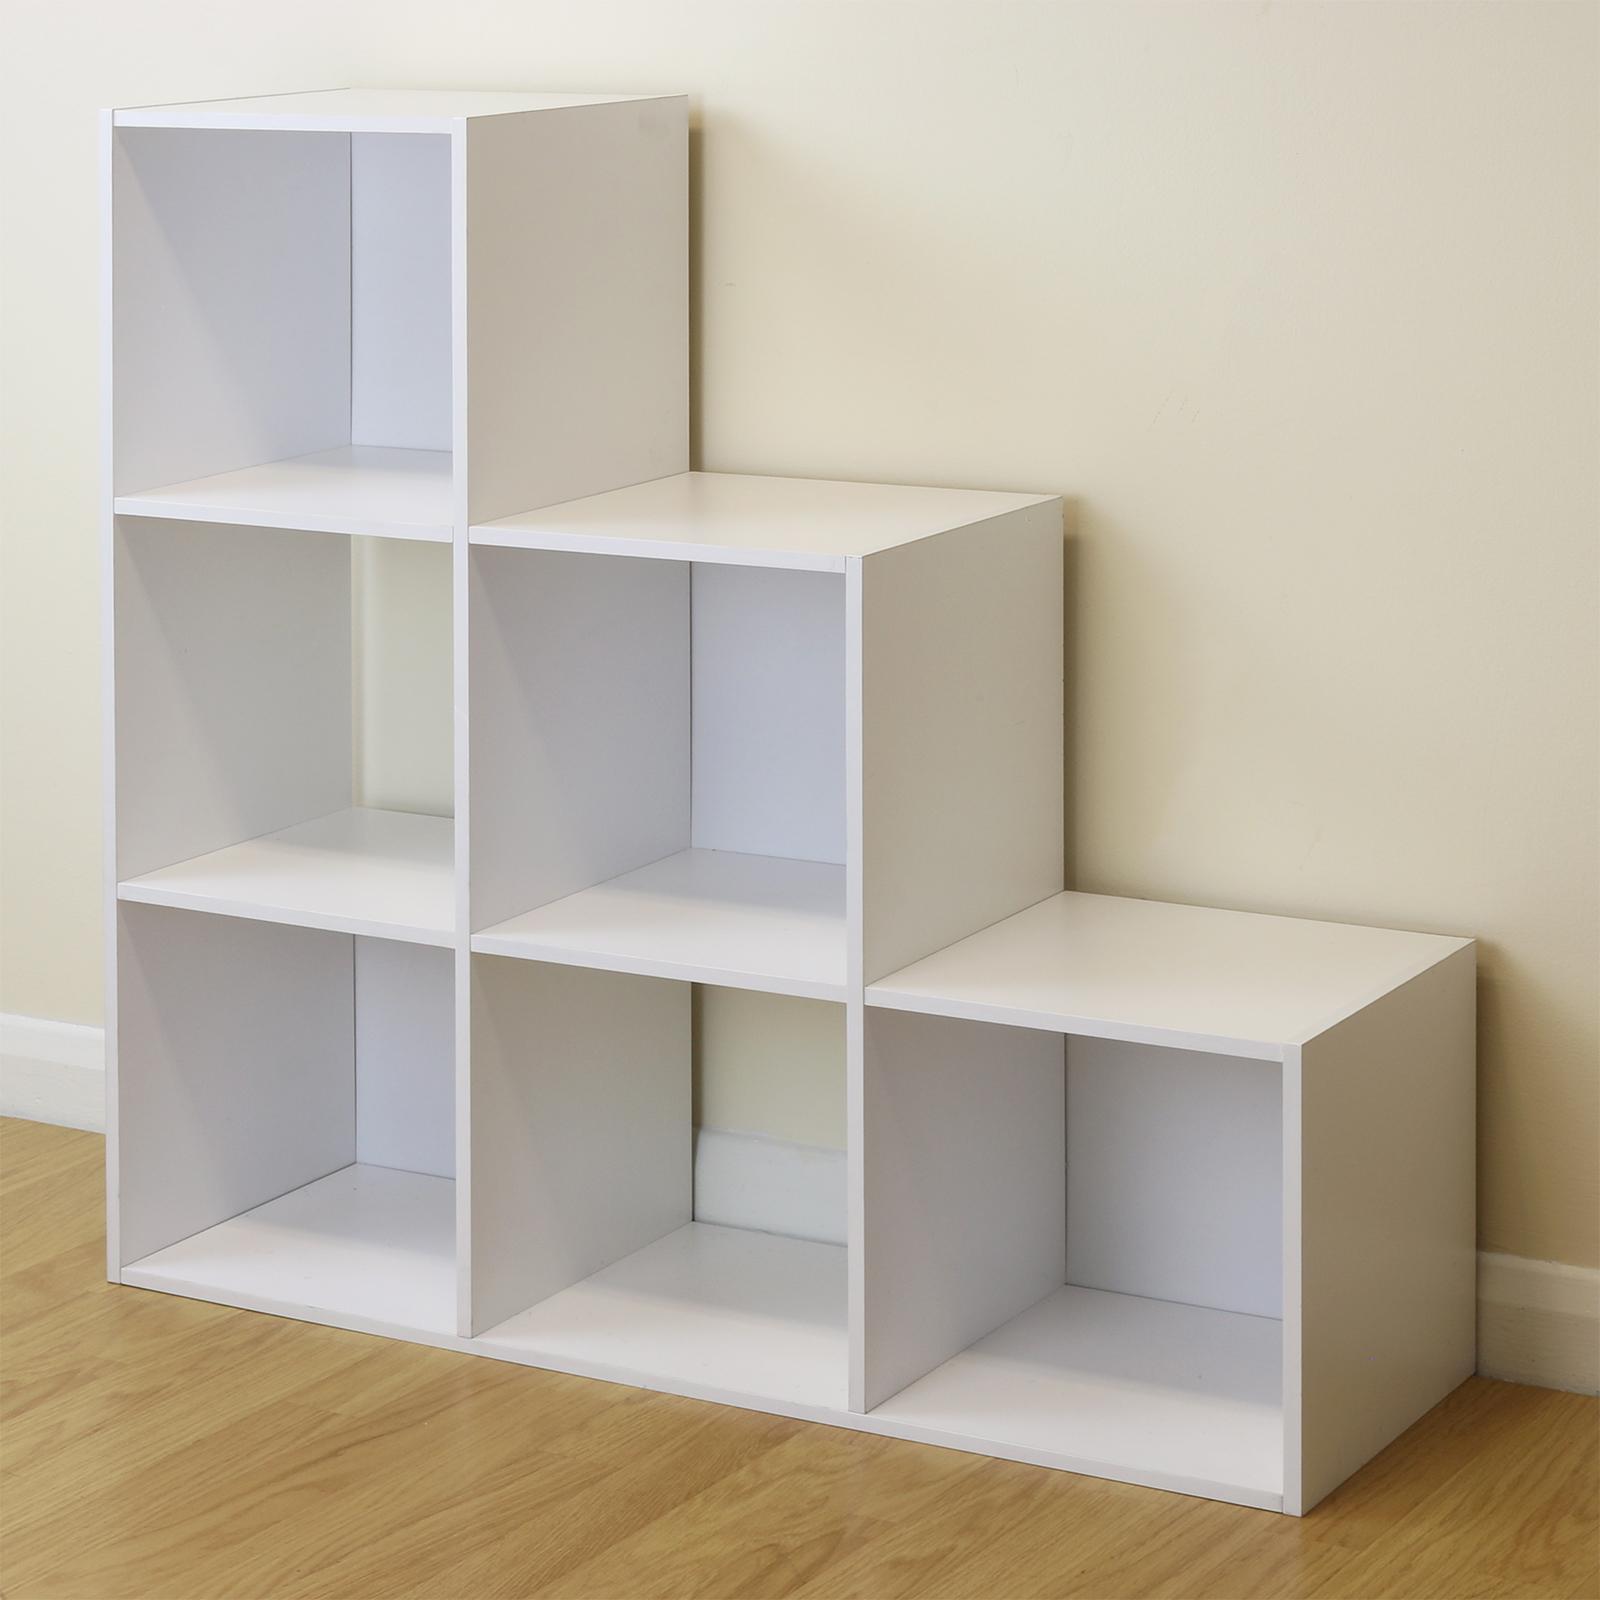 6 Cube Kids White Toy Games Storage Unit Girls Boys Childs: Boxed Shelving